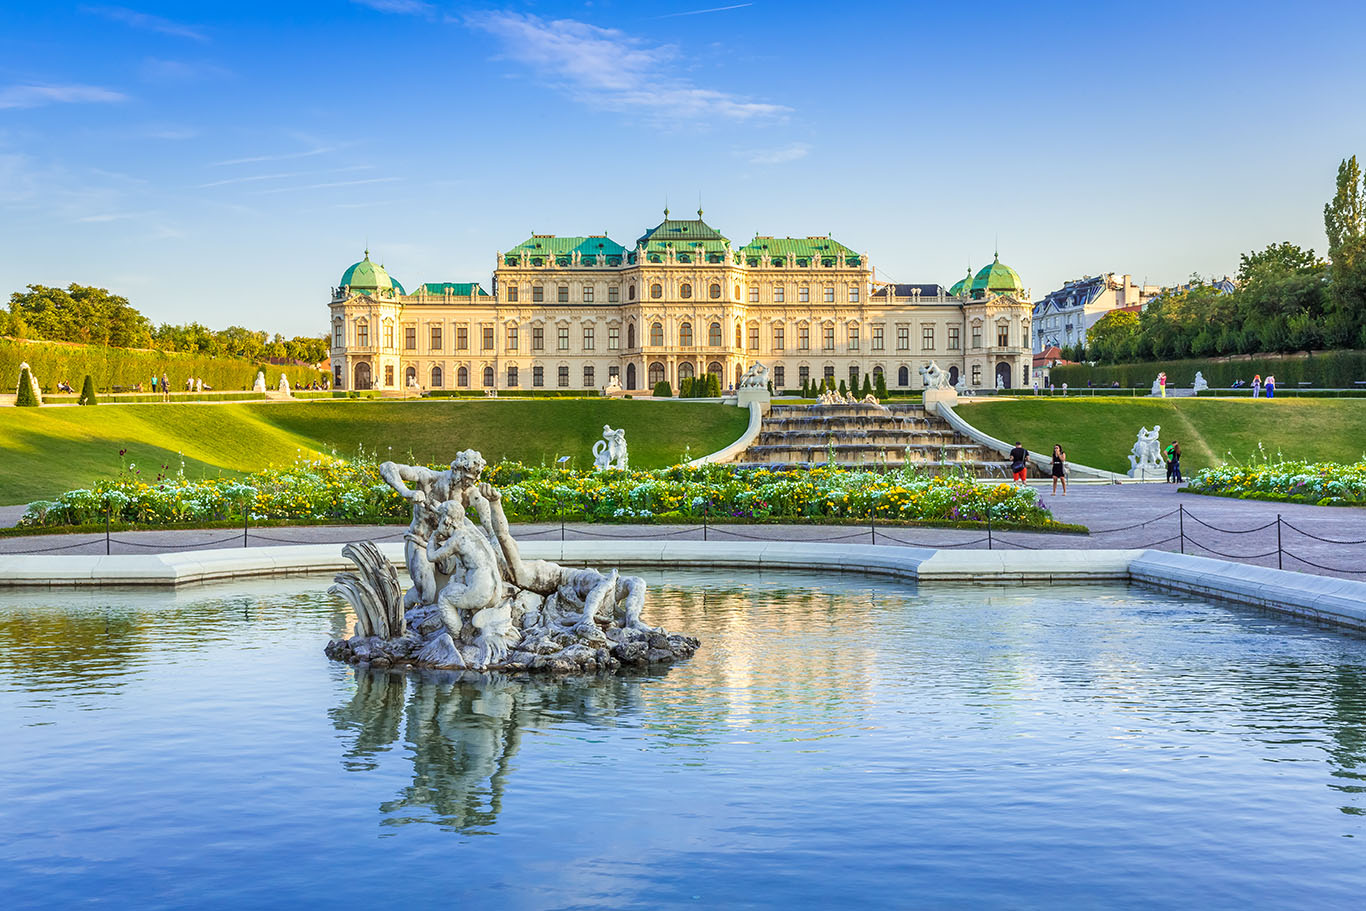 Wien-Landstrasse-Schloss-Belvedere